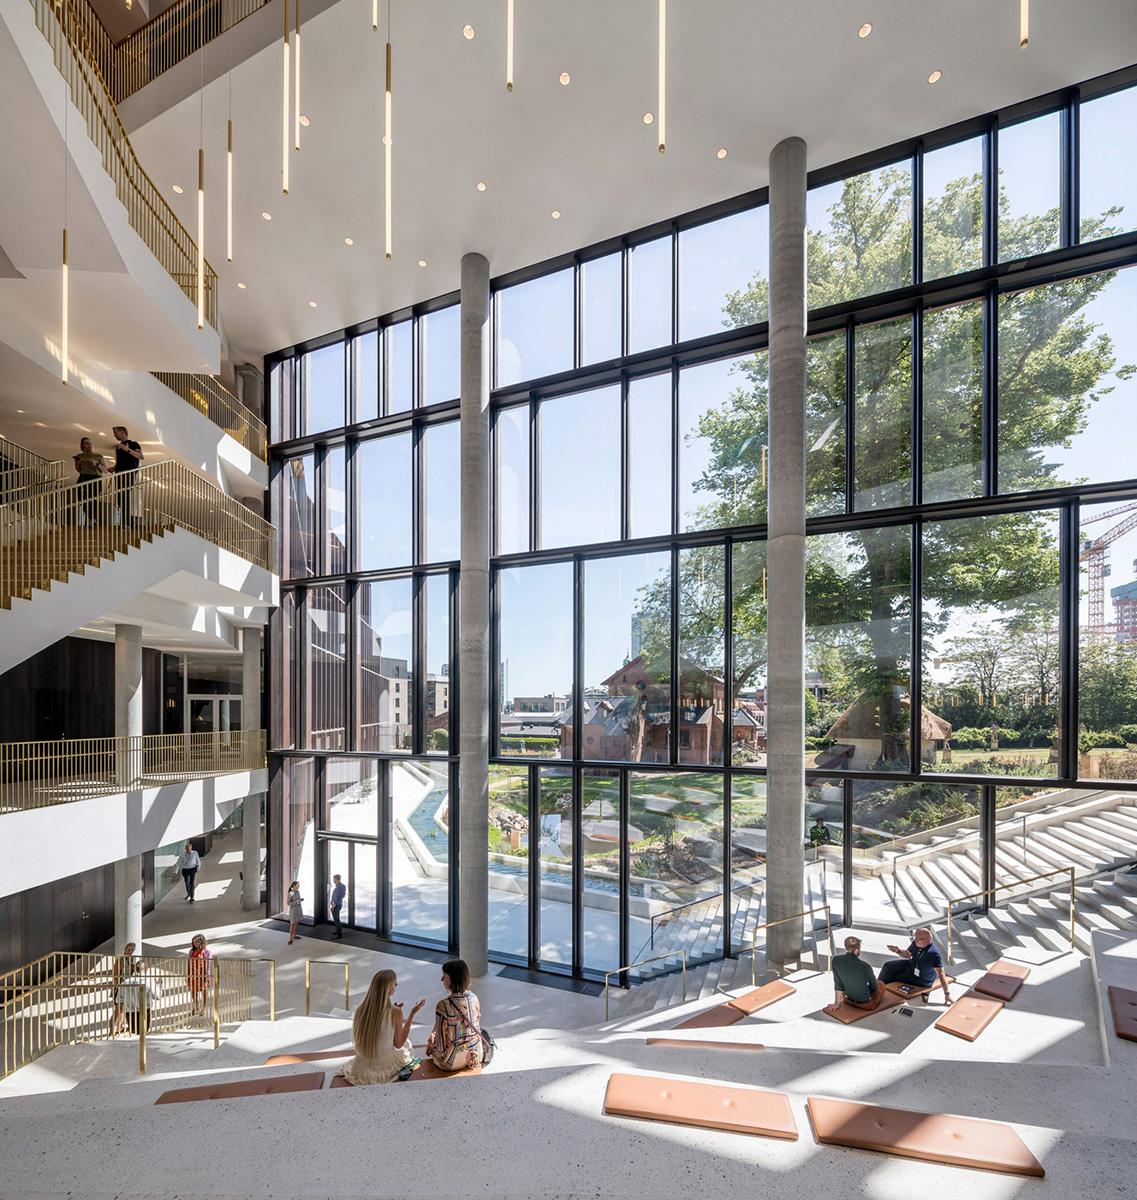 Carlsberg-Group-HQ-CF-Moller-Architects-Adam-Mork-04